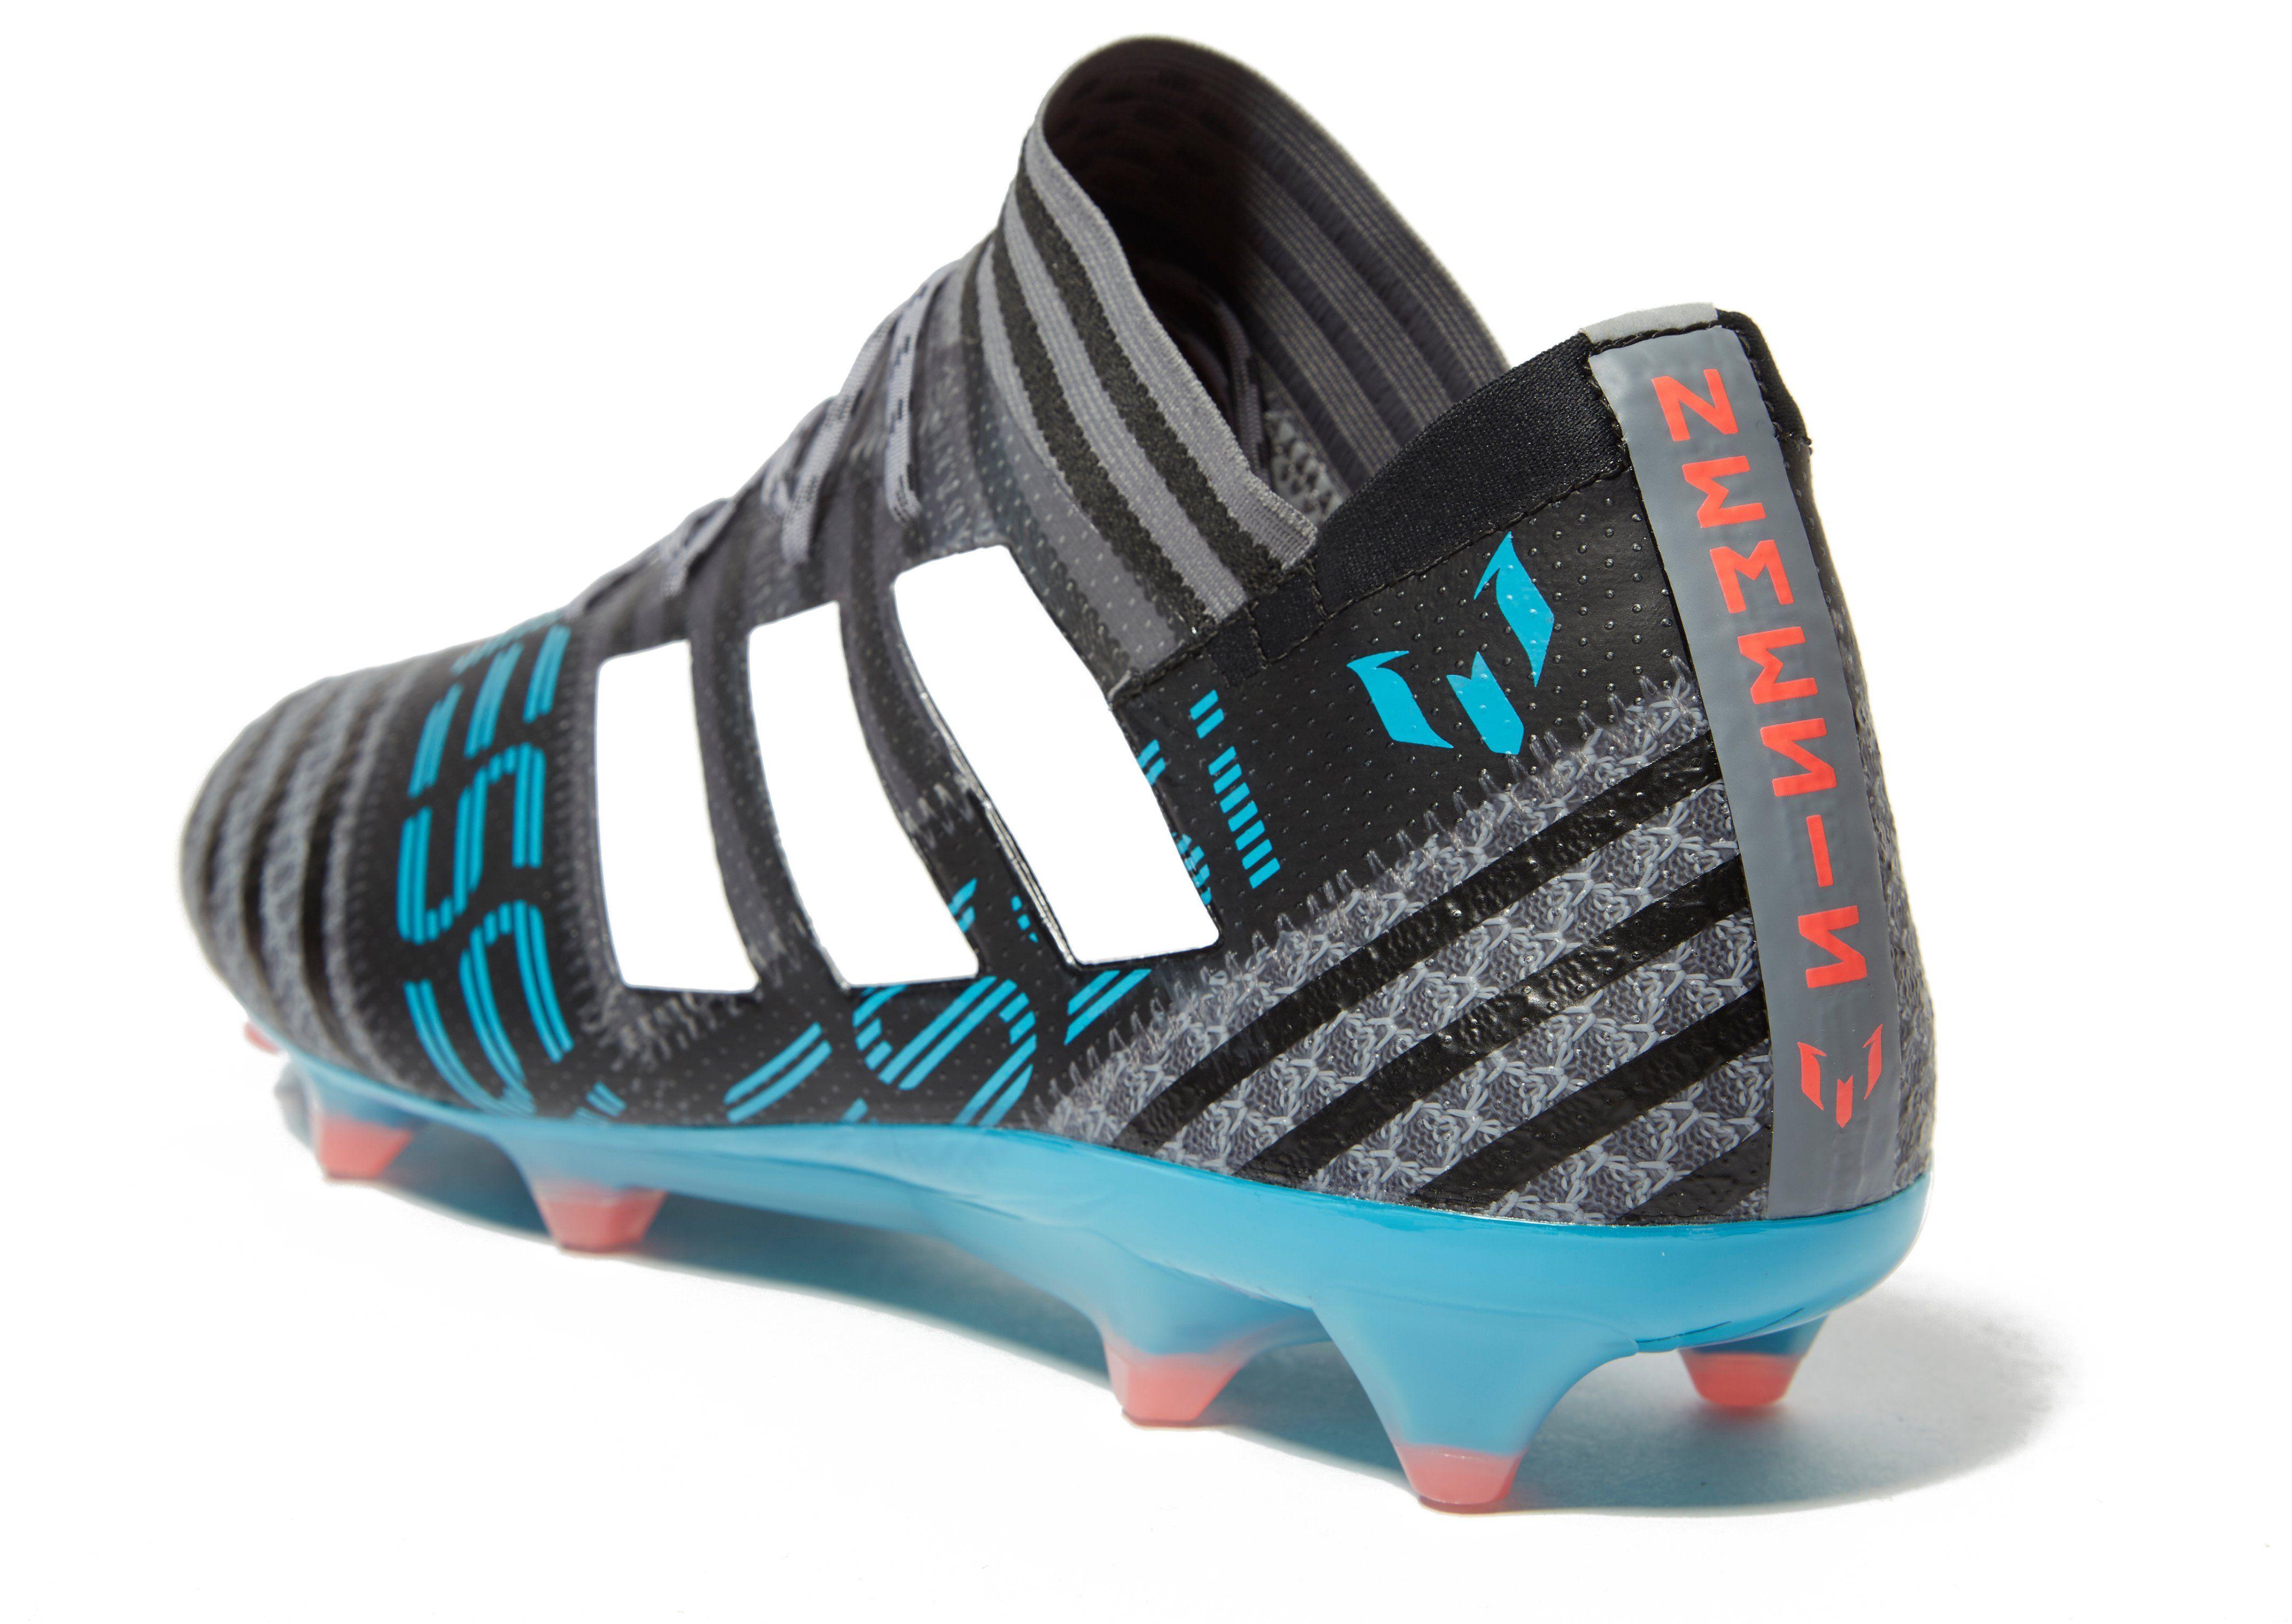 adidas Cold Blooded Nemeziz Messi 17.1 FG